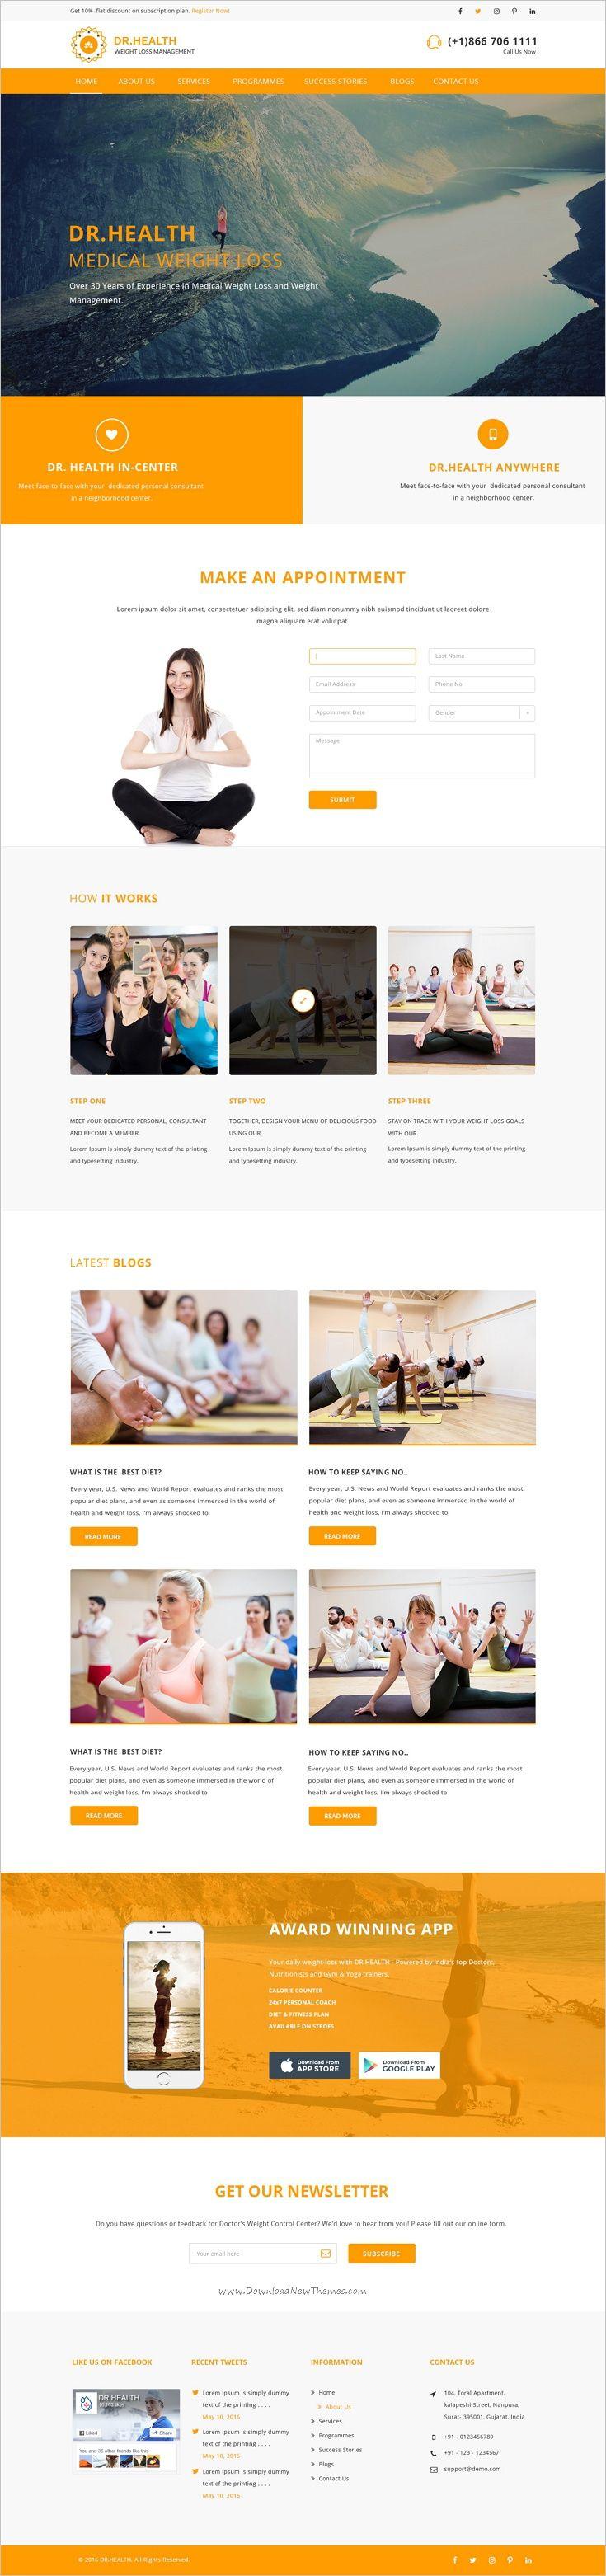 The 25 best Yoga Studio images on Pinterest | Design web, Design ...